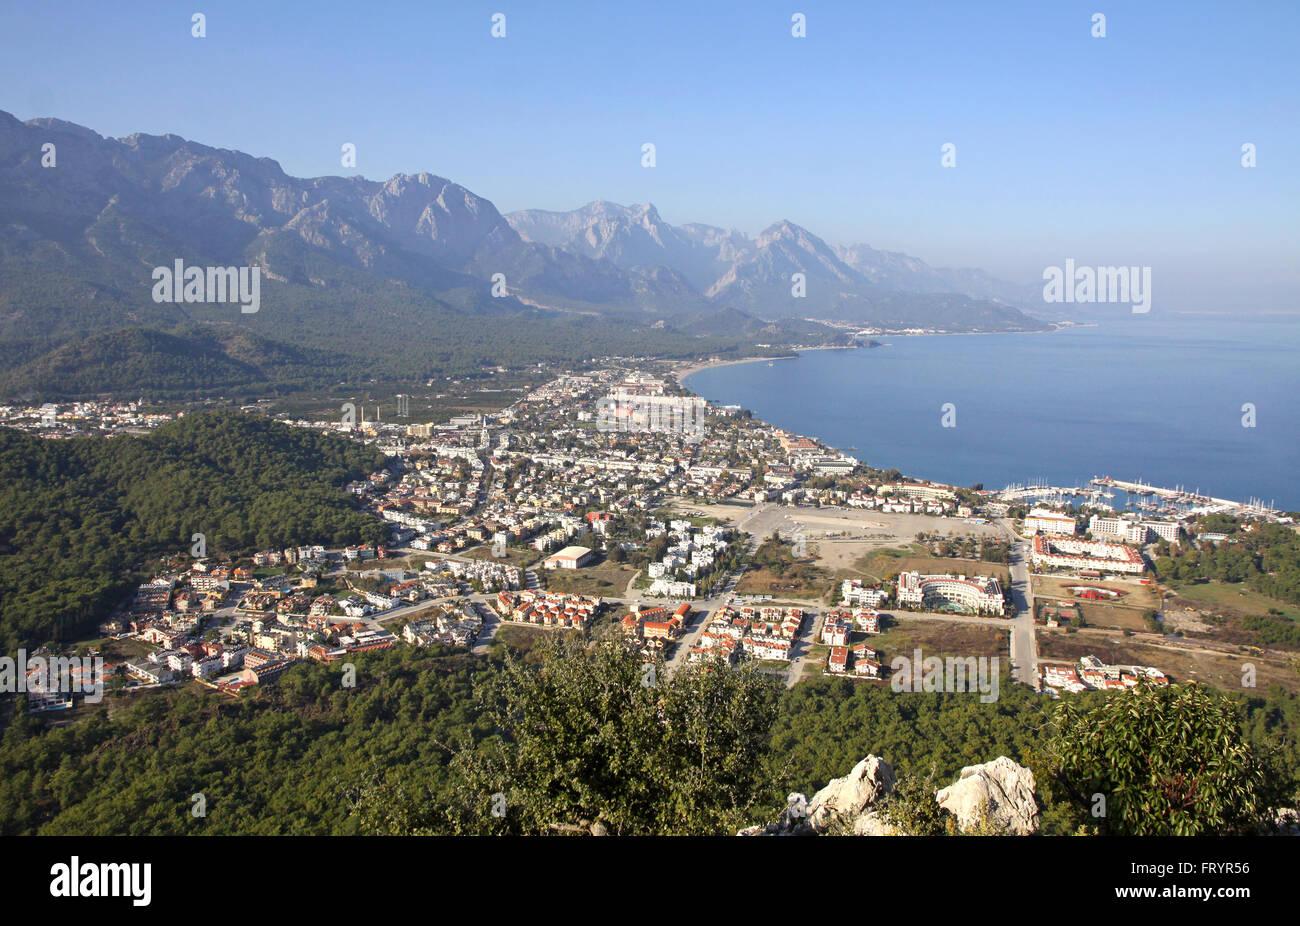 Aerial view of Kemer city, Antalya province, Turkey - Stock Image